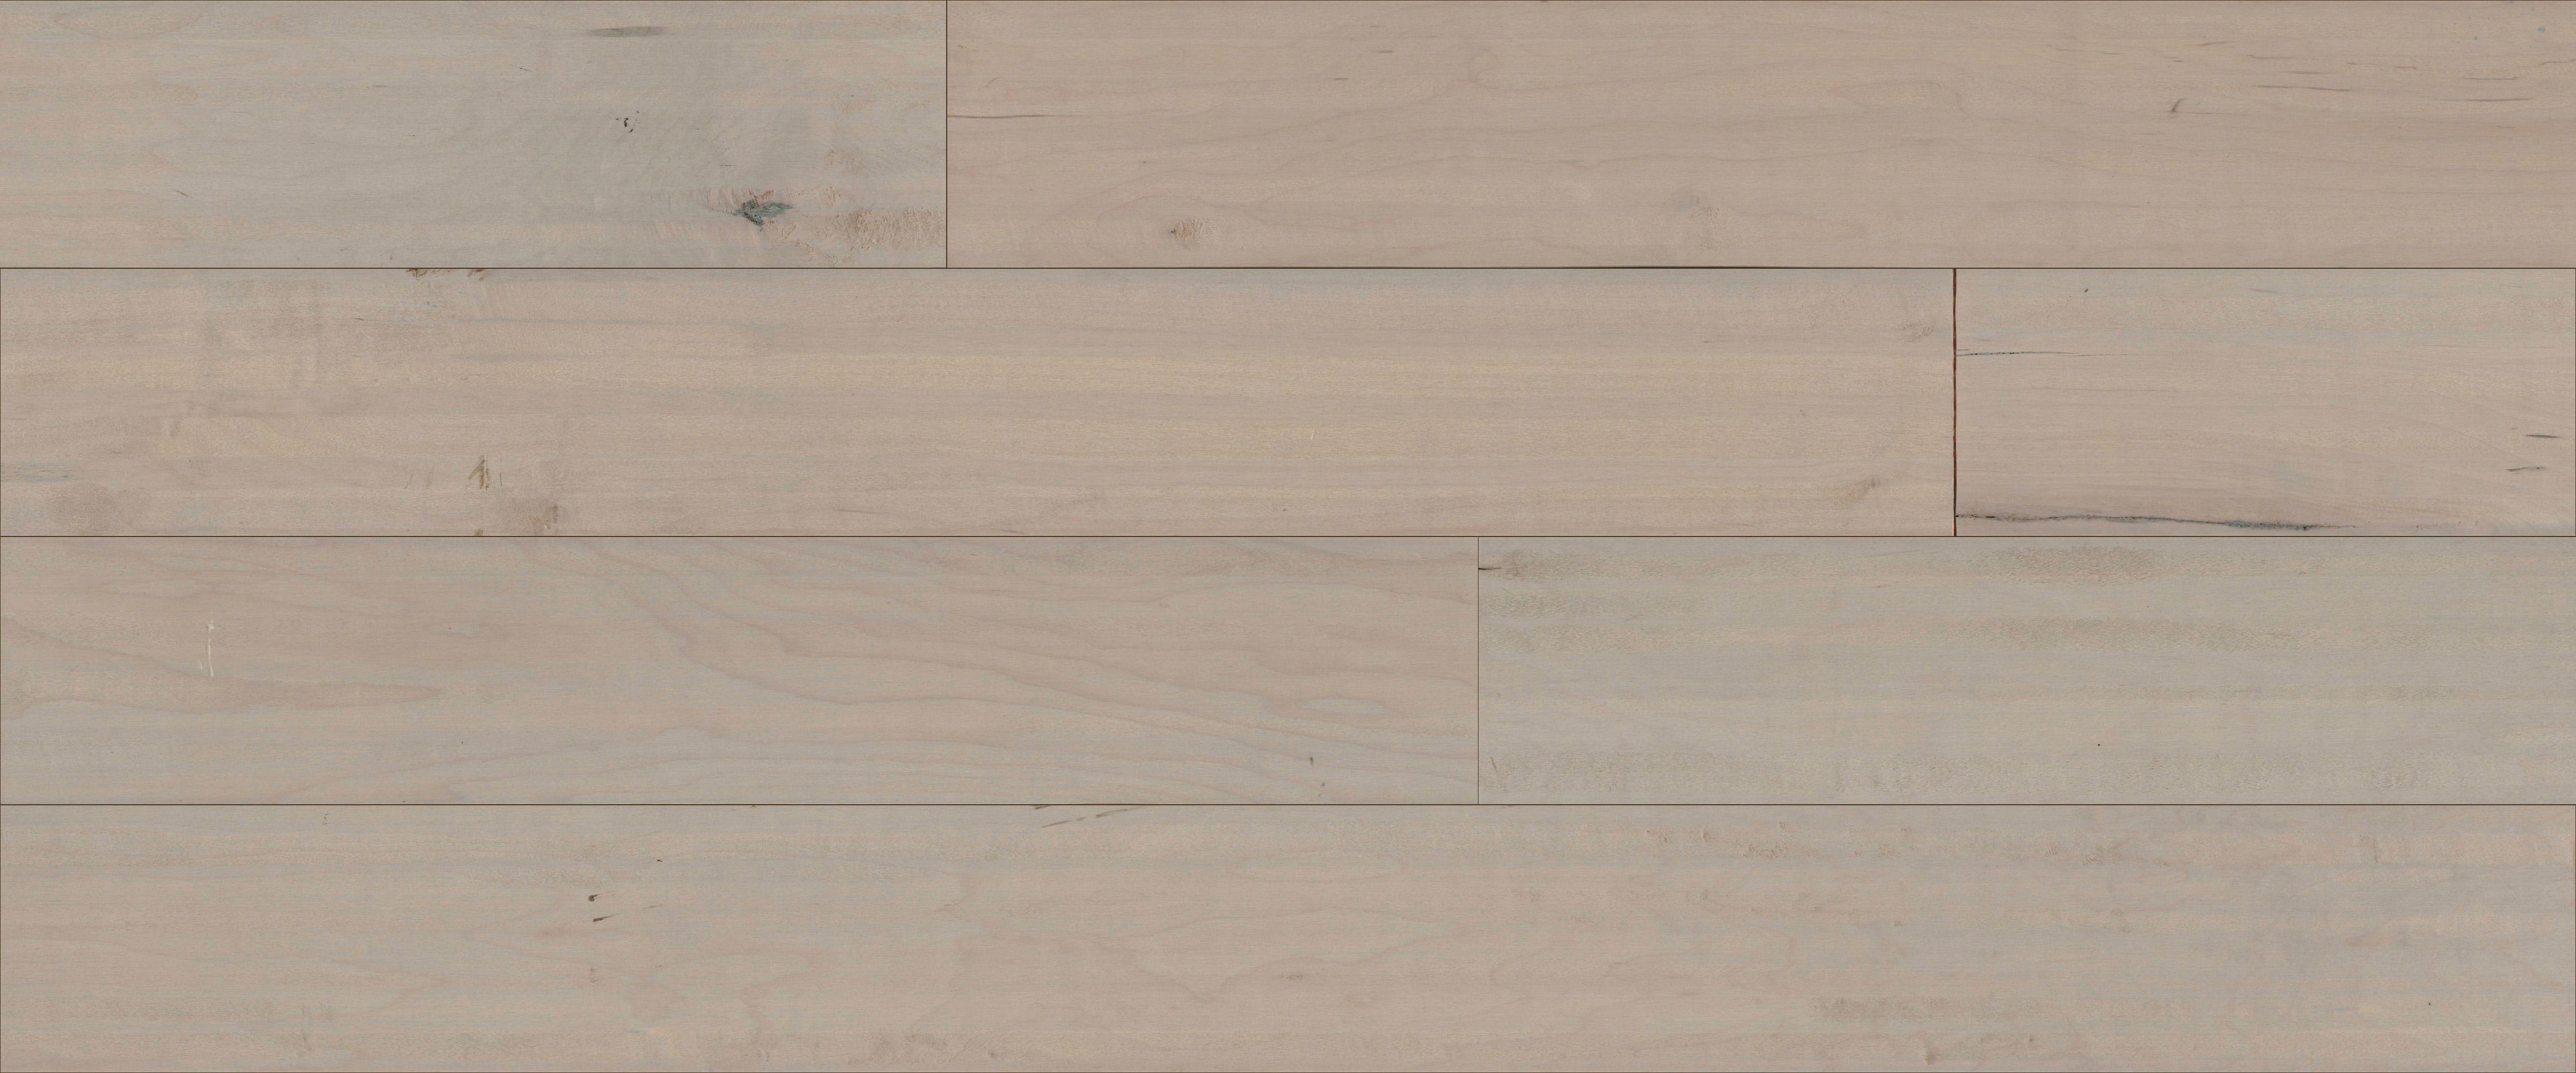 5 16 engineered hardwood flooring of mullican lincolnshire sculpted maple frost 5 engineered hardwood regarding mullican lincolnshire sculpted maple frost 5 engineered hardwood flooring